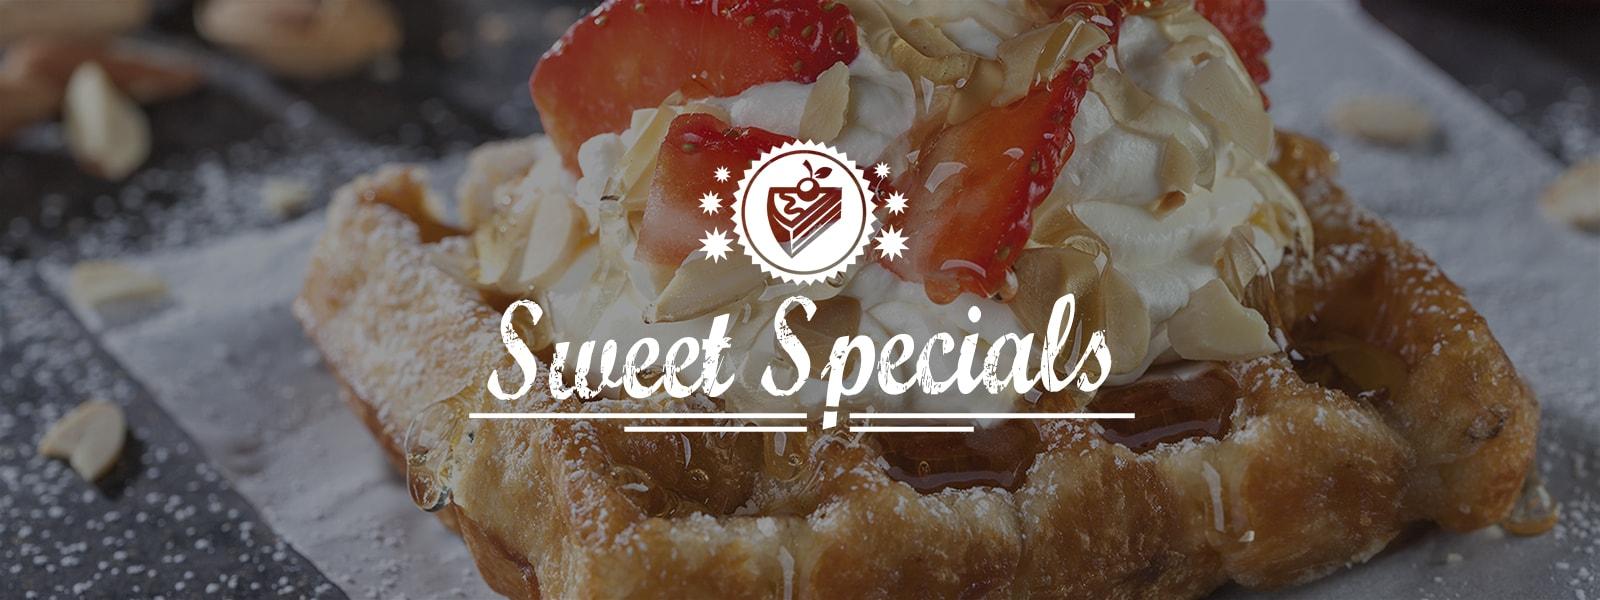 Sweet Specials